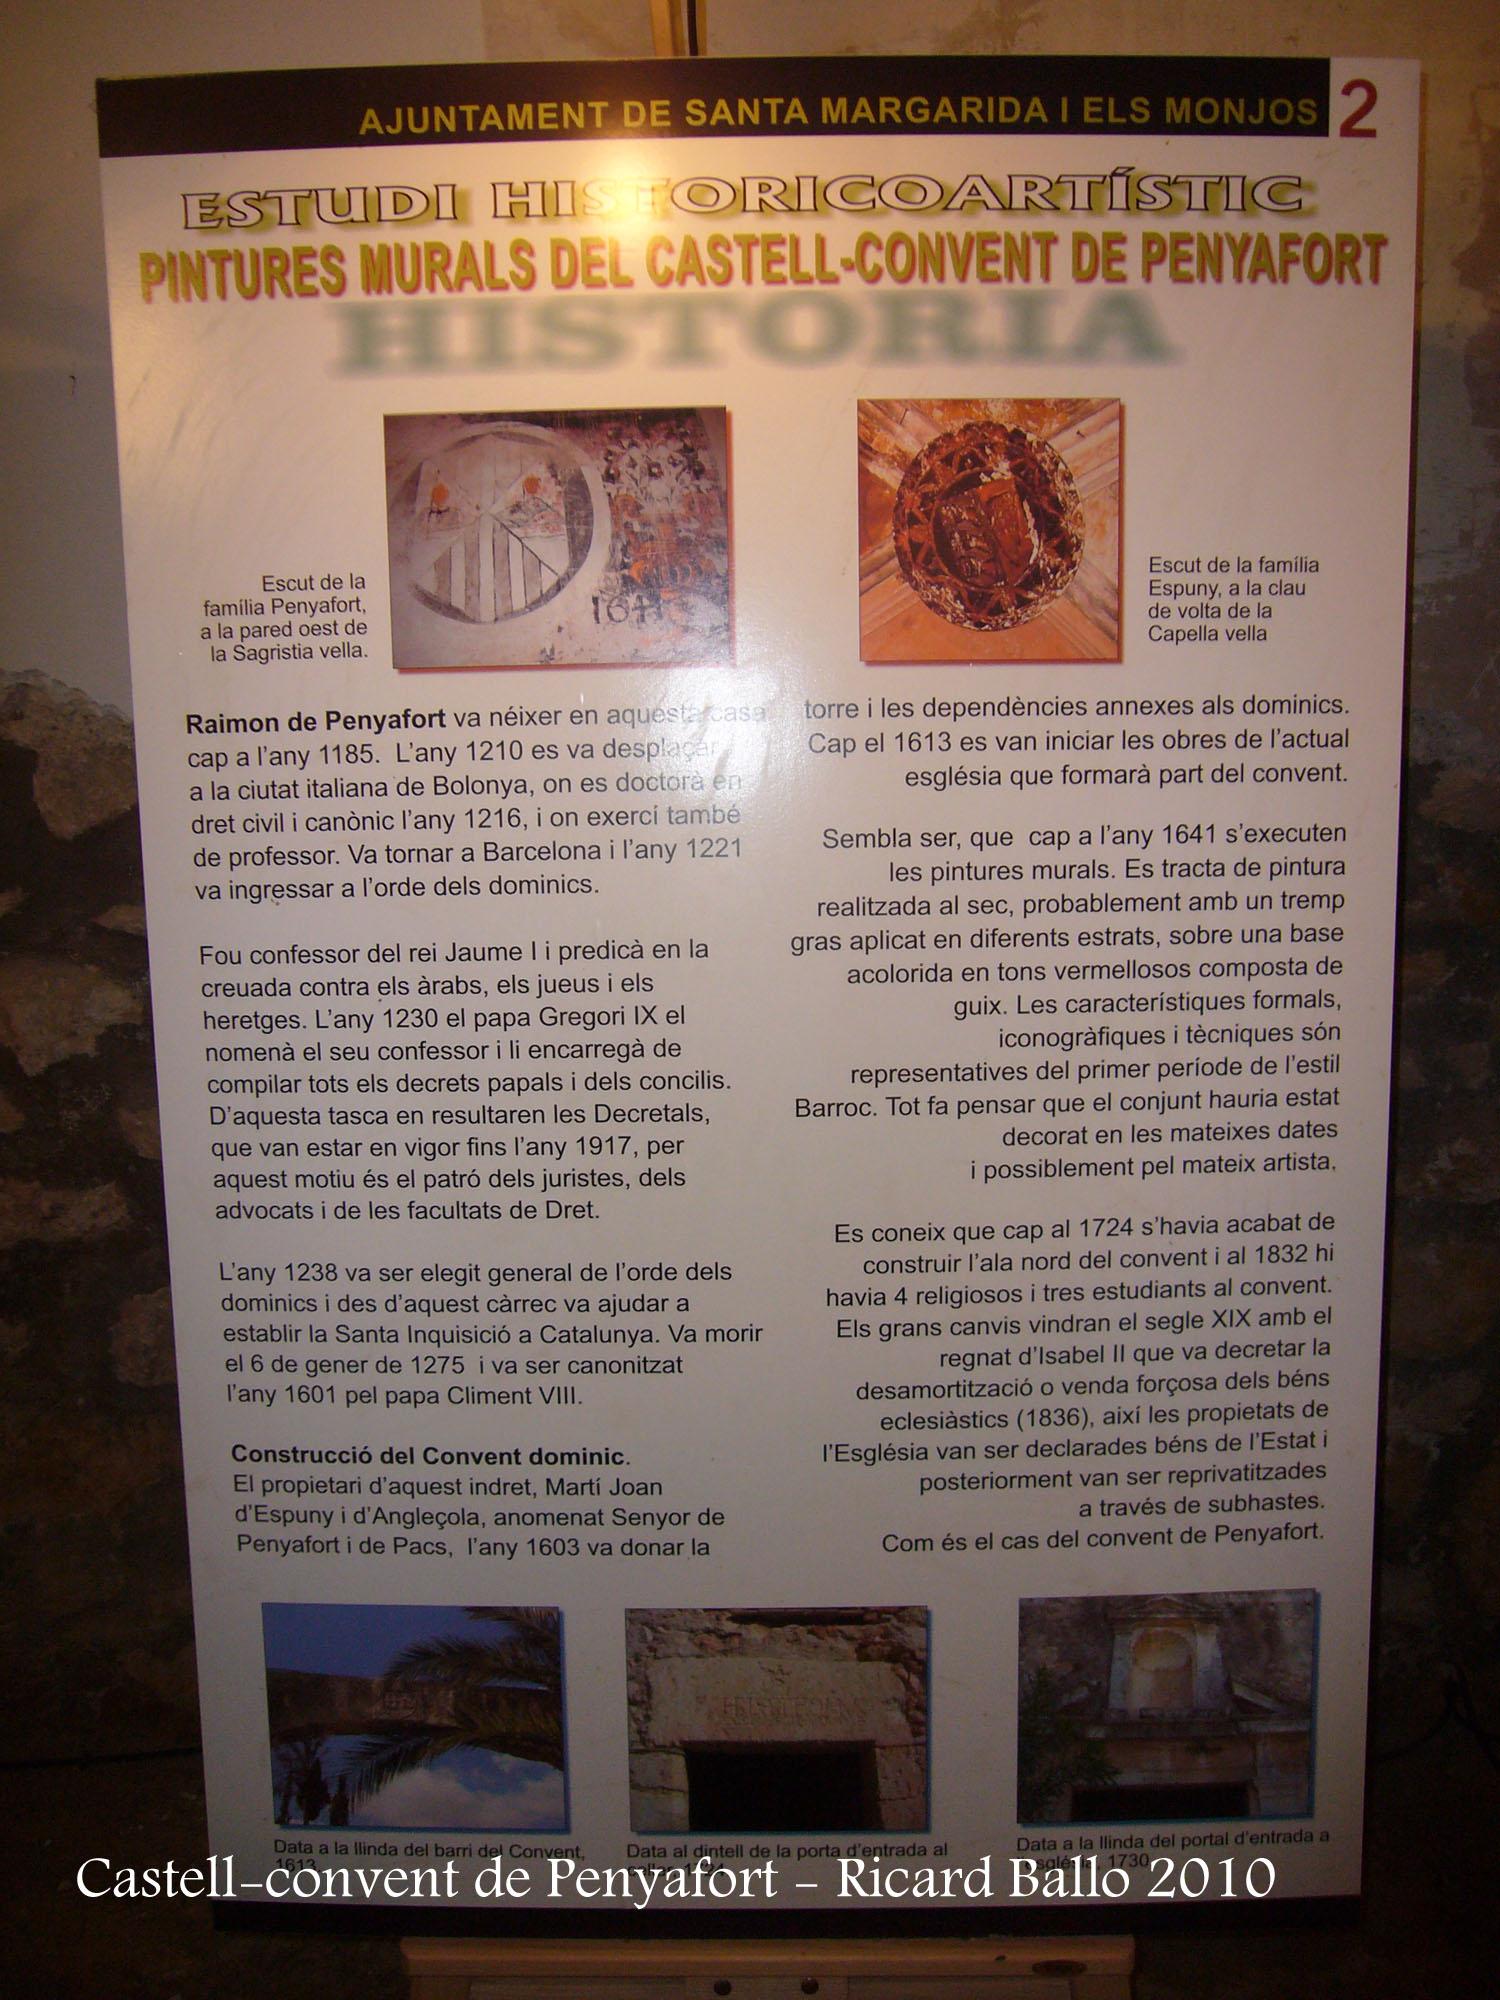 castell-convent-de-penyafort-100612_526